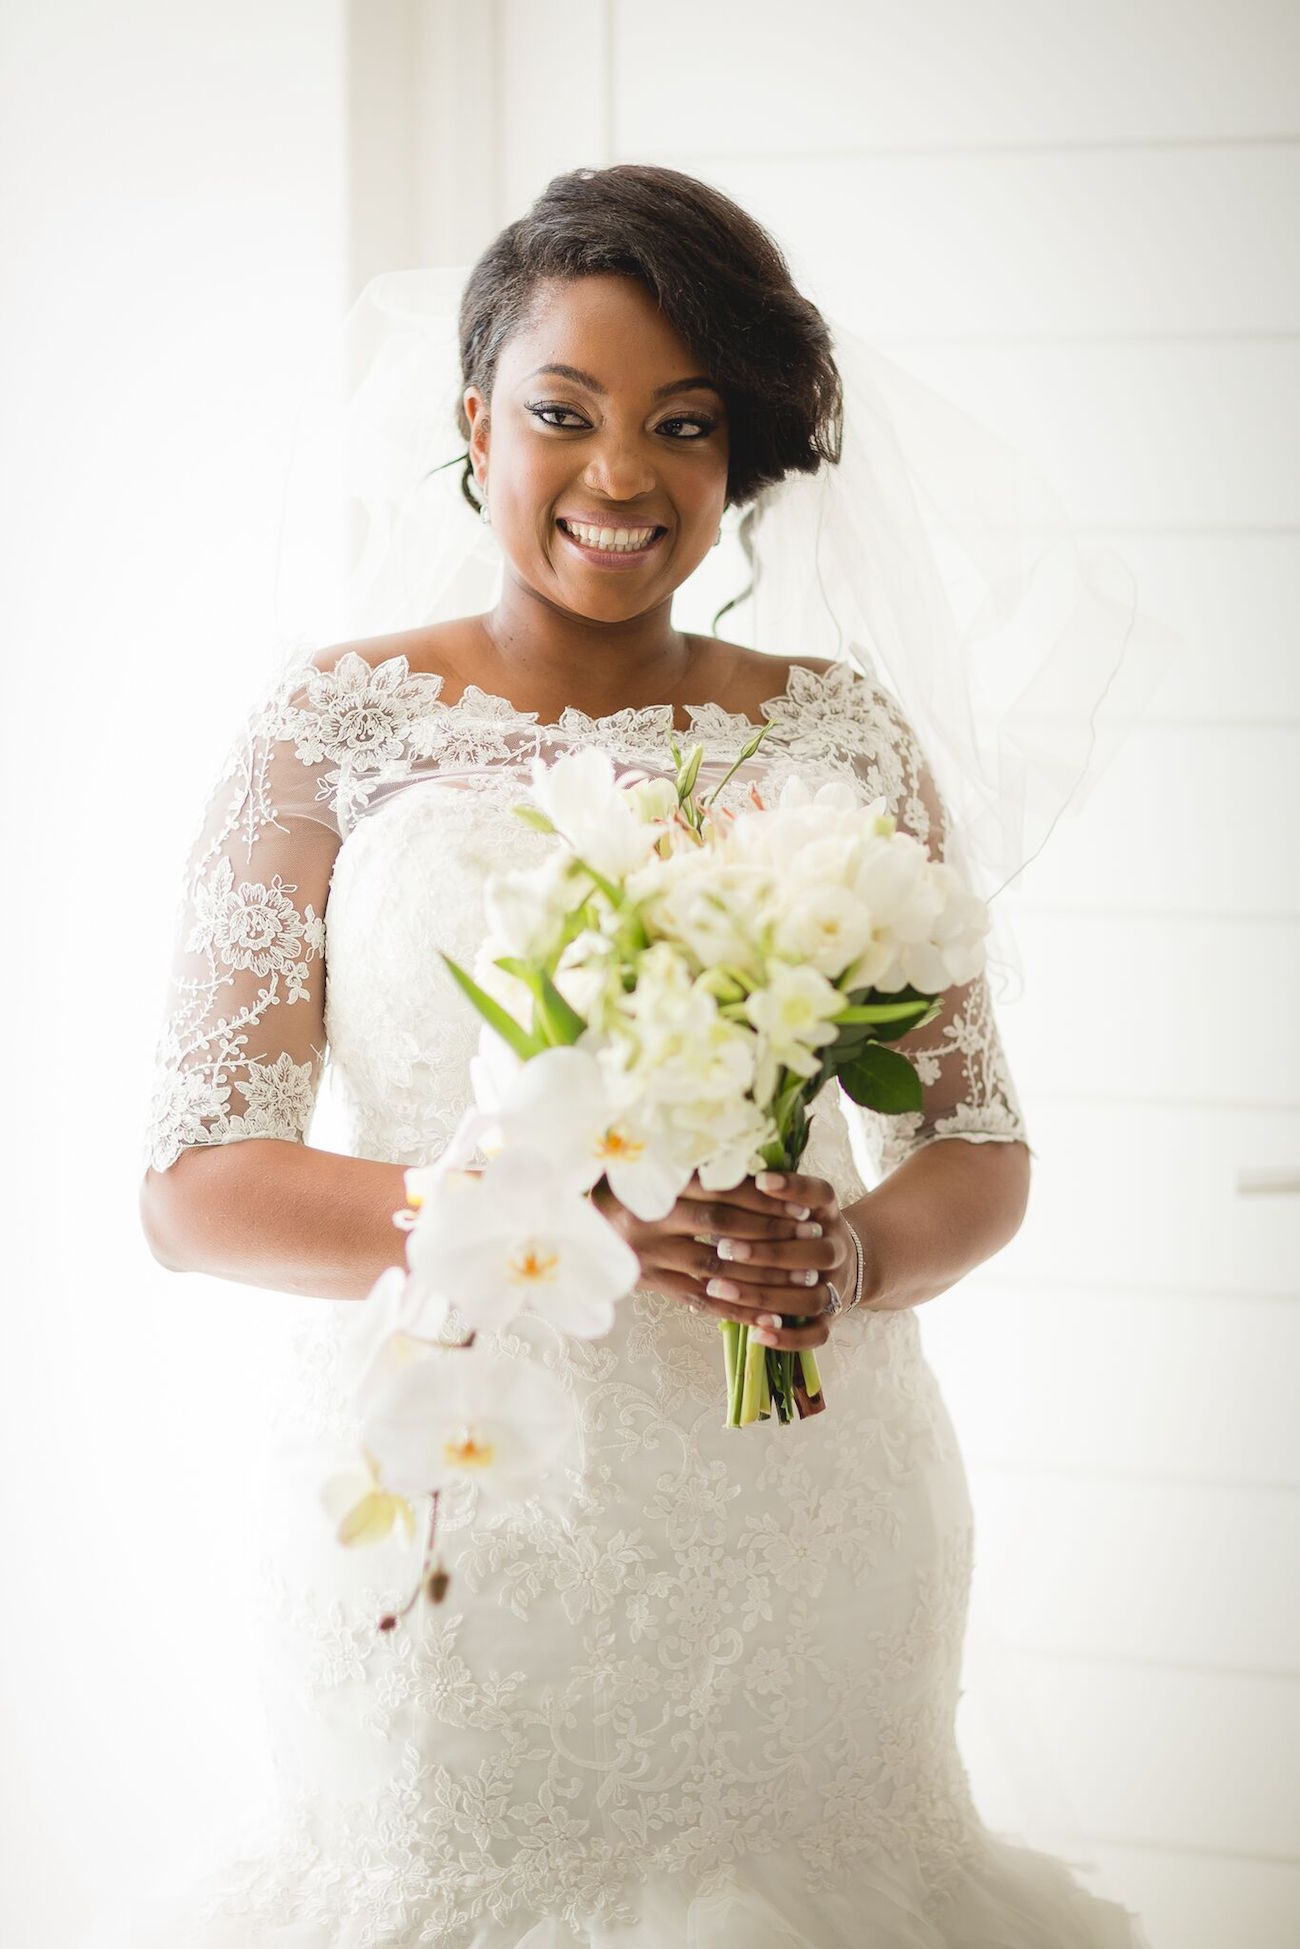 Lace Sleeve Wedding Dress | Image: Daryl Glass